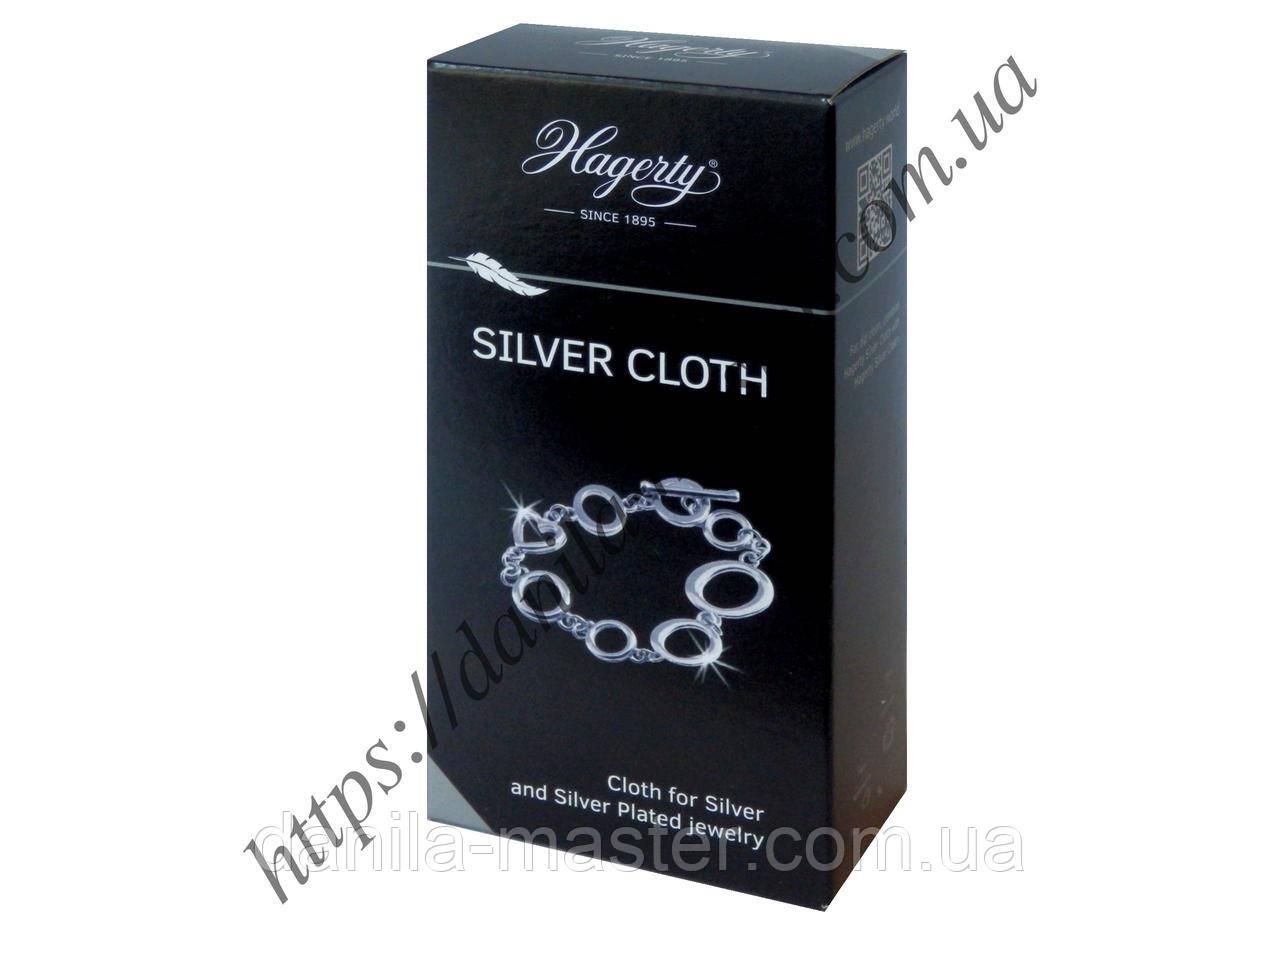 Салфетка для ухода за изделиями из серебра Hagerty SILVER CLOTH